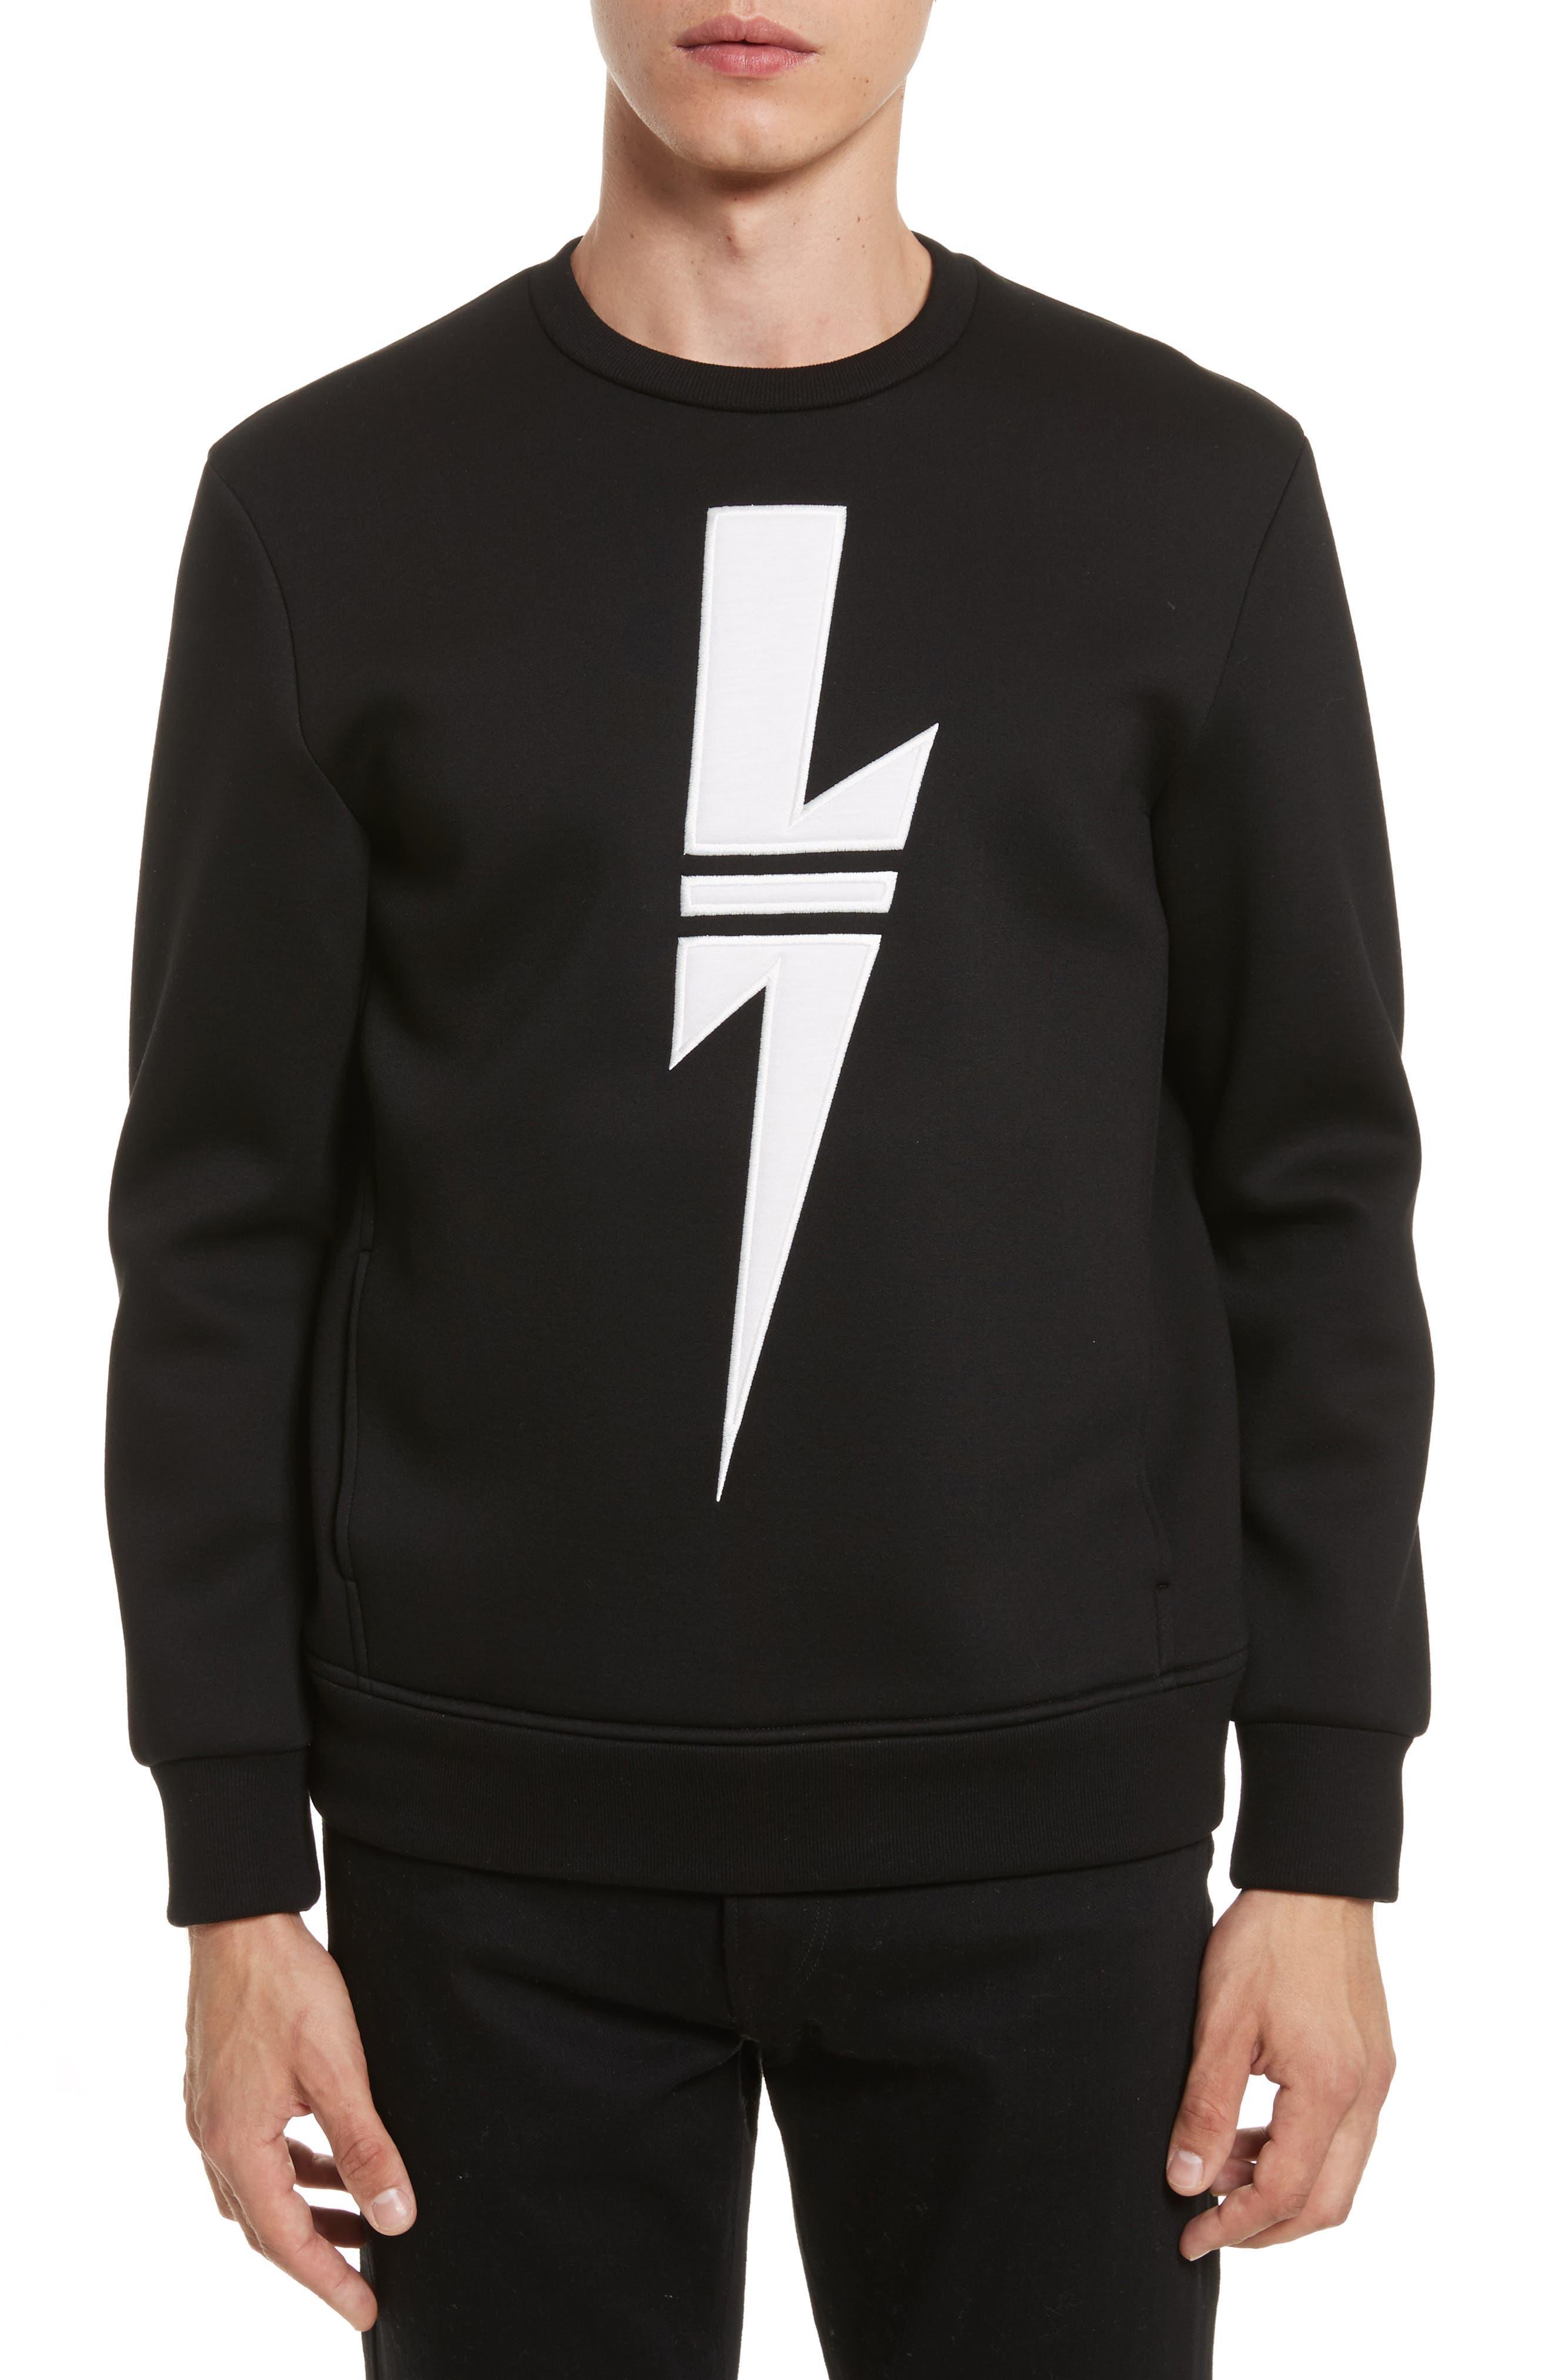 Neil Barrett New Thunderbolt Sweatshirt